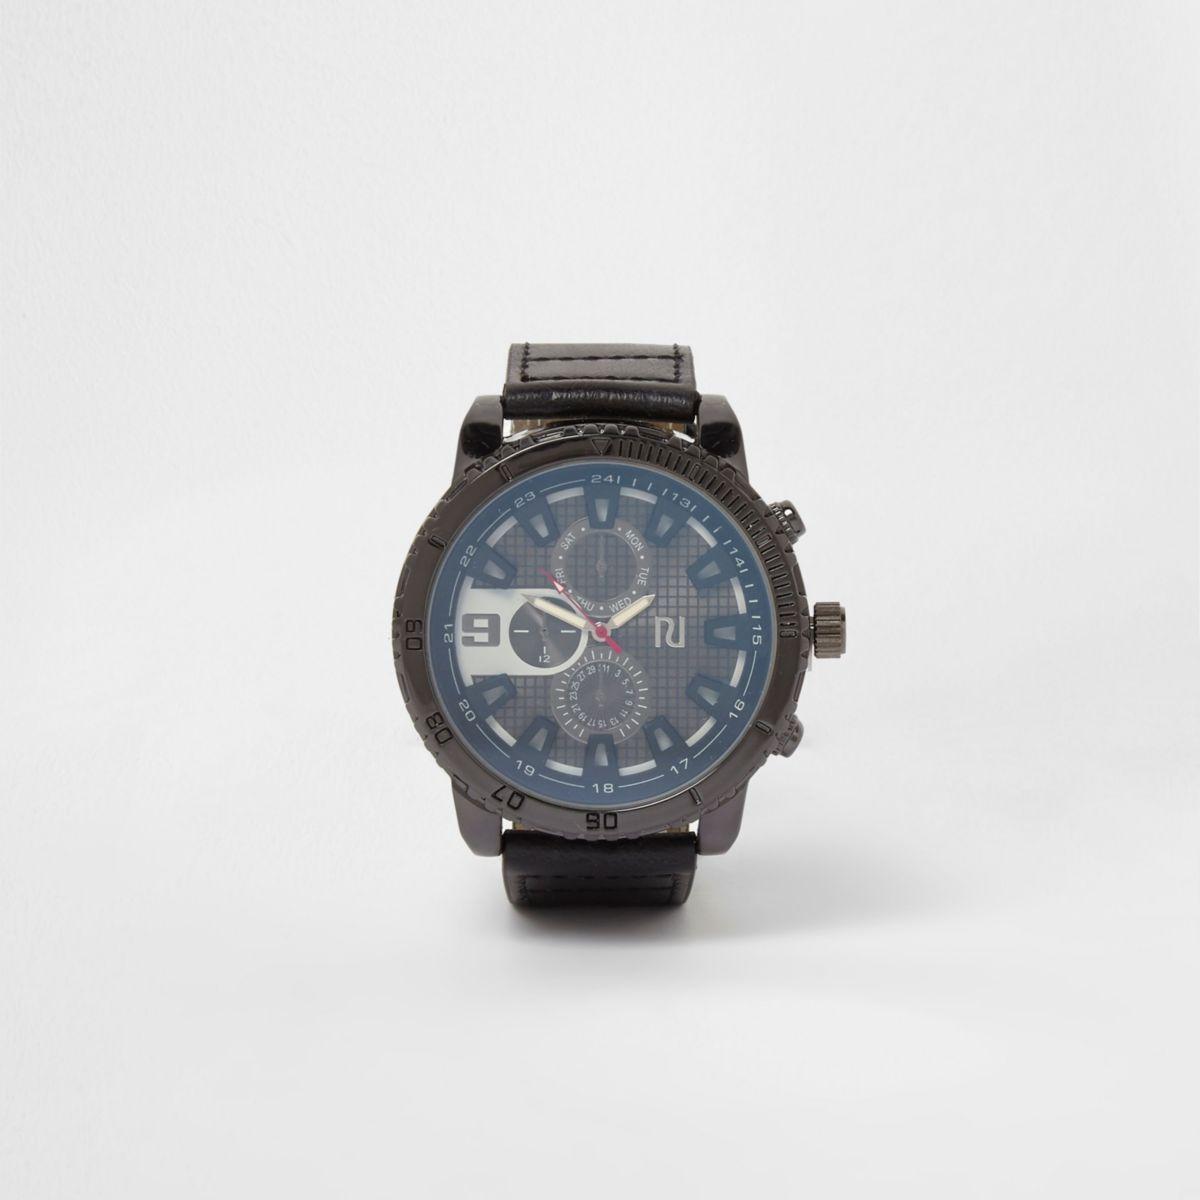 Schwarze Armbanduhr aus Lederimitat mit großem Zifferblatt